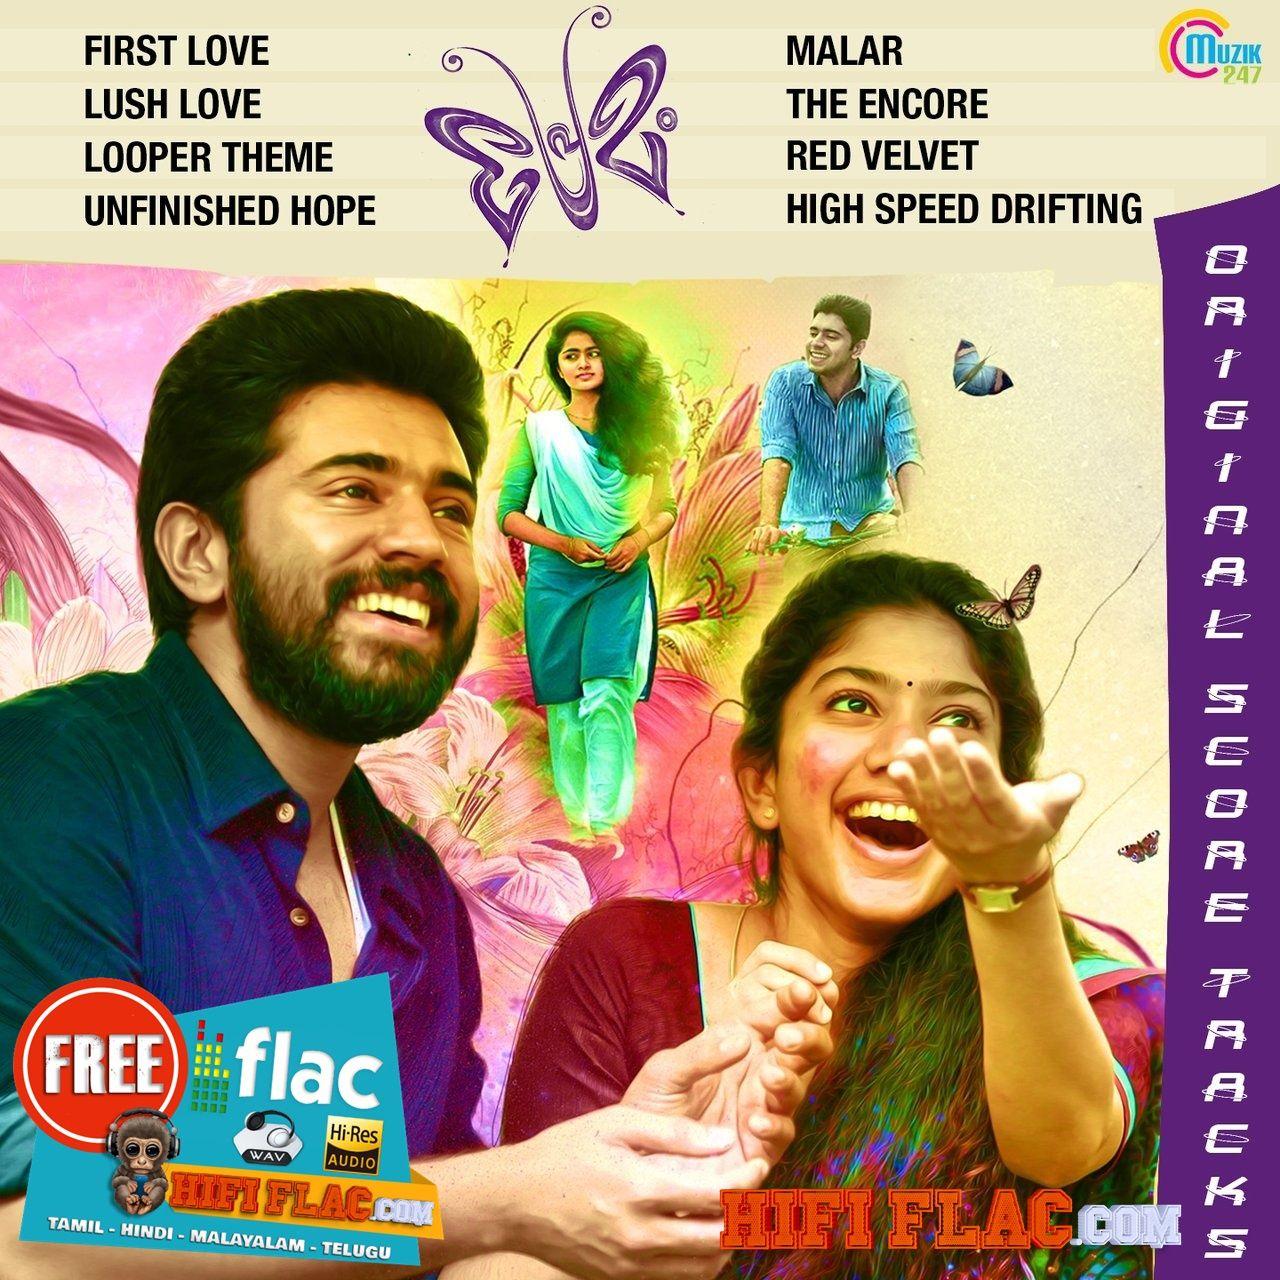 Premam (Original Song Background Score)[2015-Malayalam